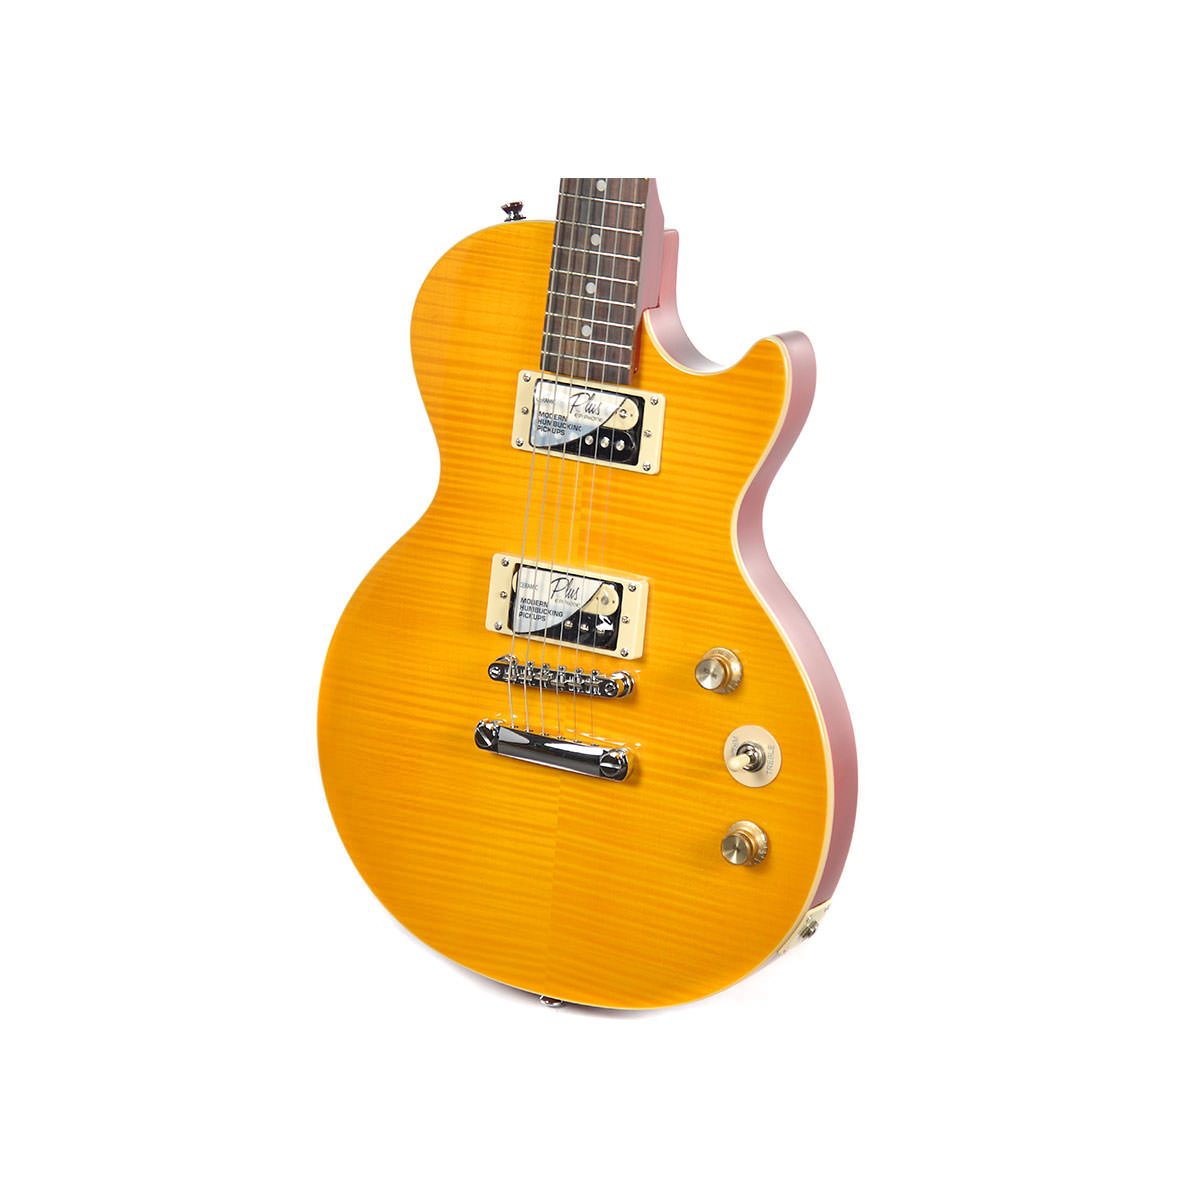 "Epiphone ""Slash"" AFD Les Paul Special II Guitar Outfit 2"